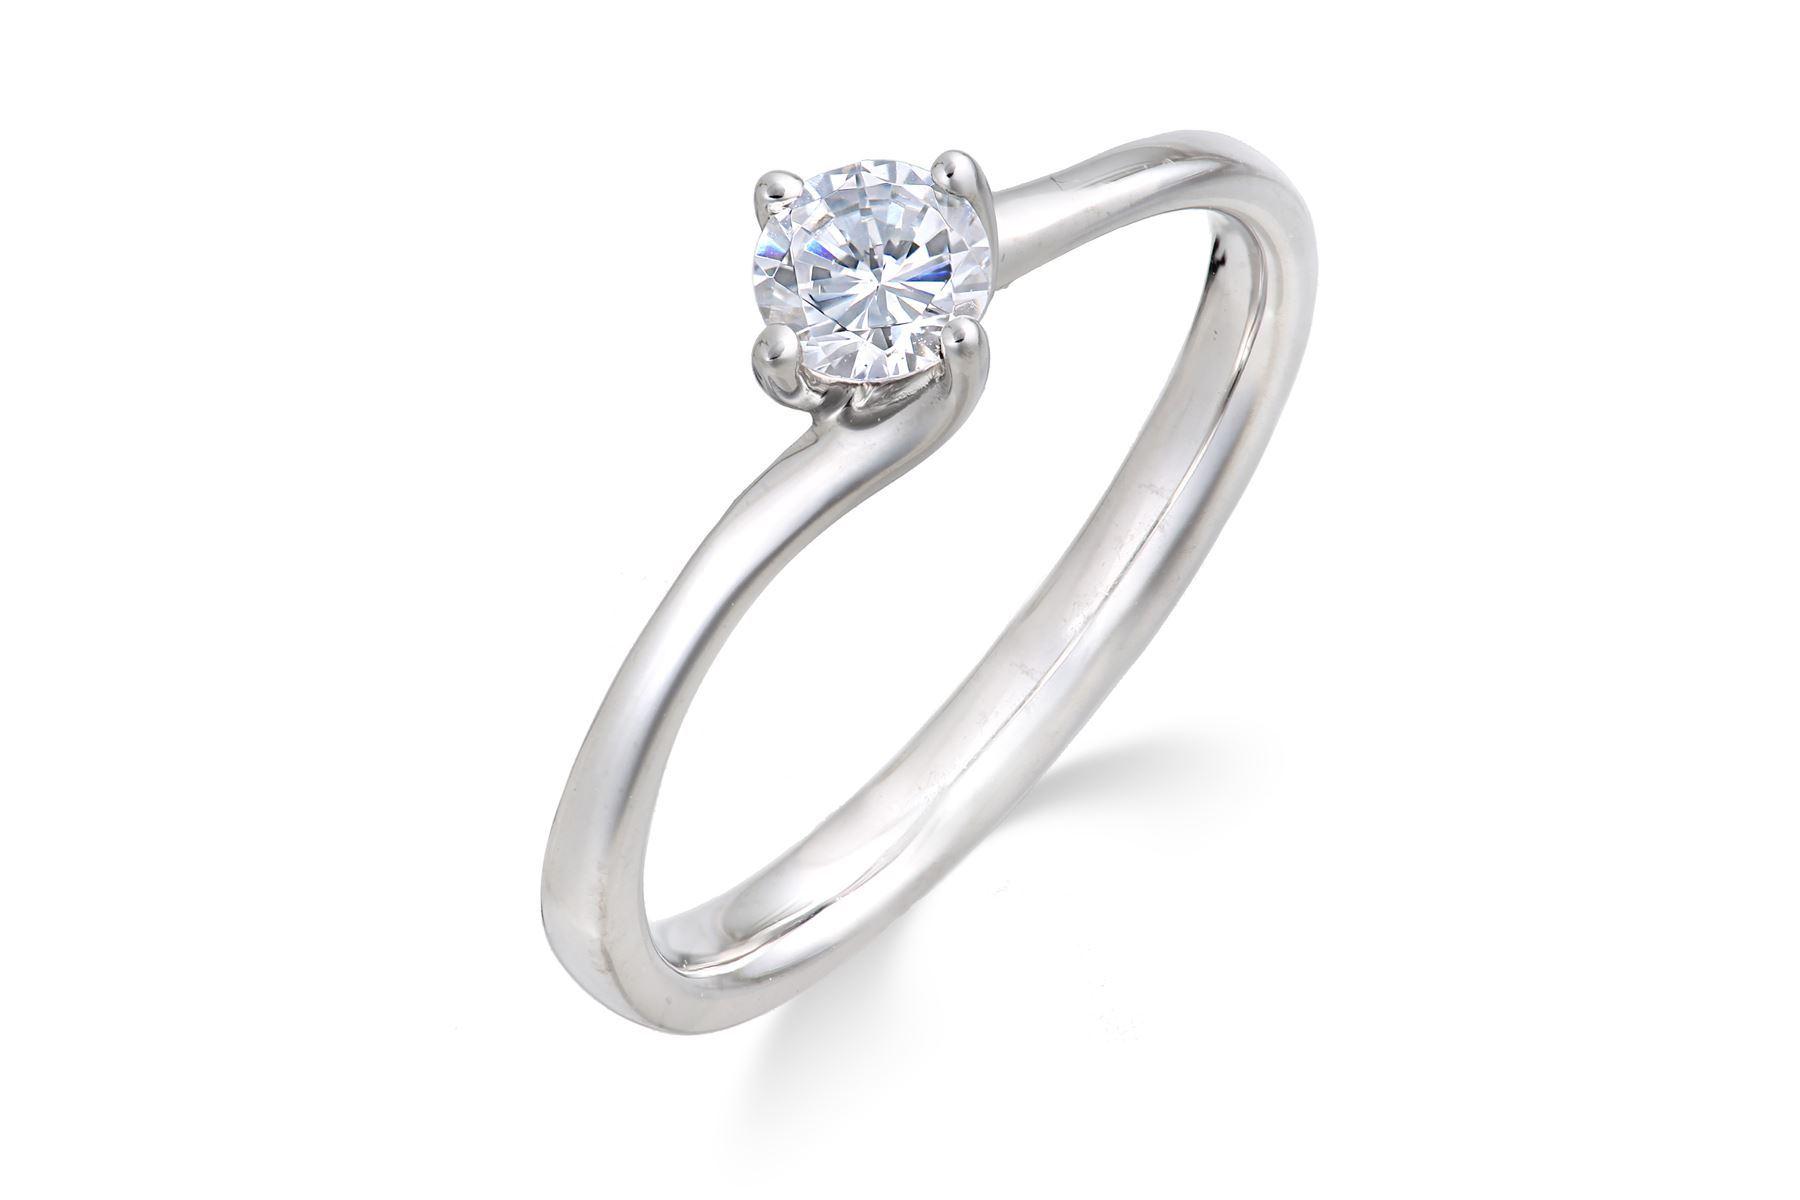 platin diamant solitaire ring mit 1 3 karat nat rlichen premium qualit t diamant ebay. Black Bedroom Furniture Sets. Home Design Ideas